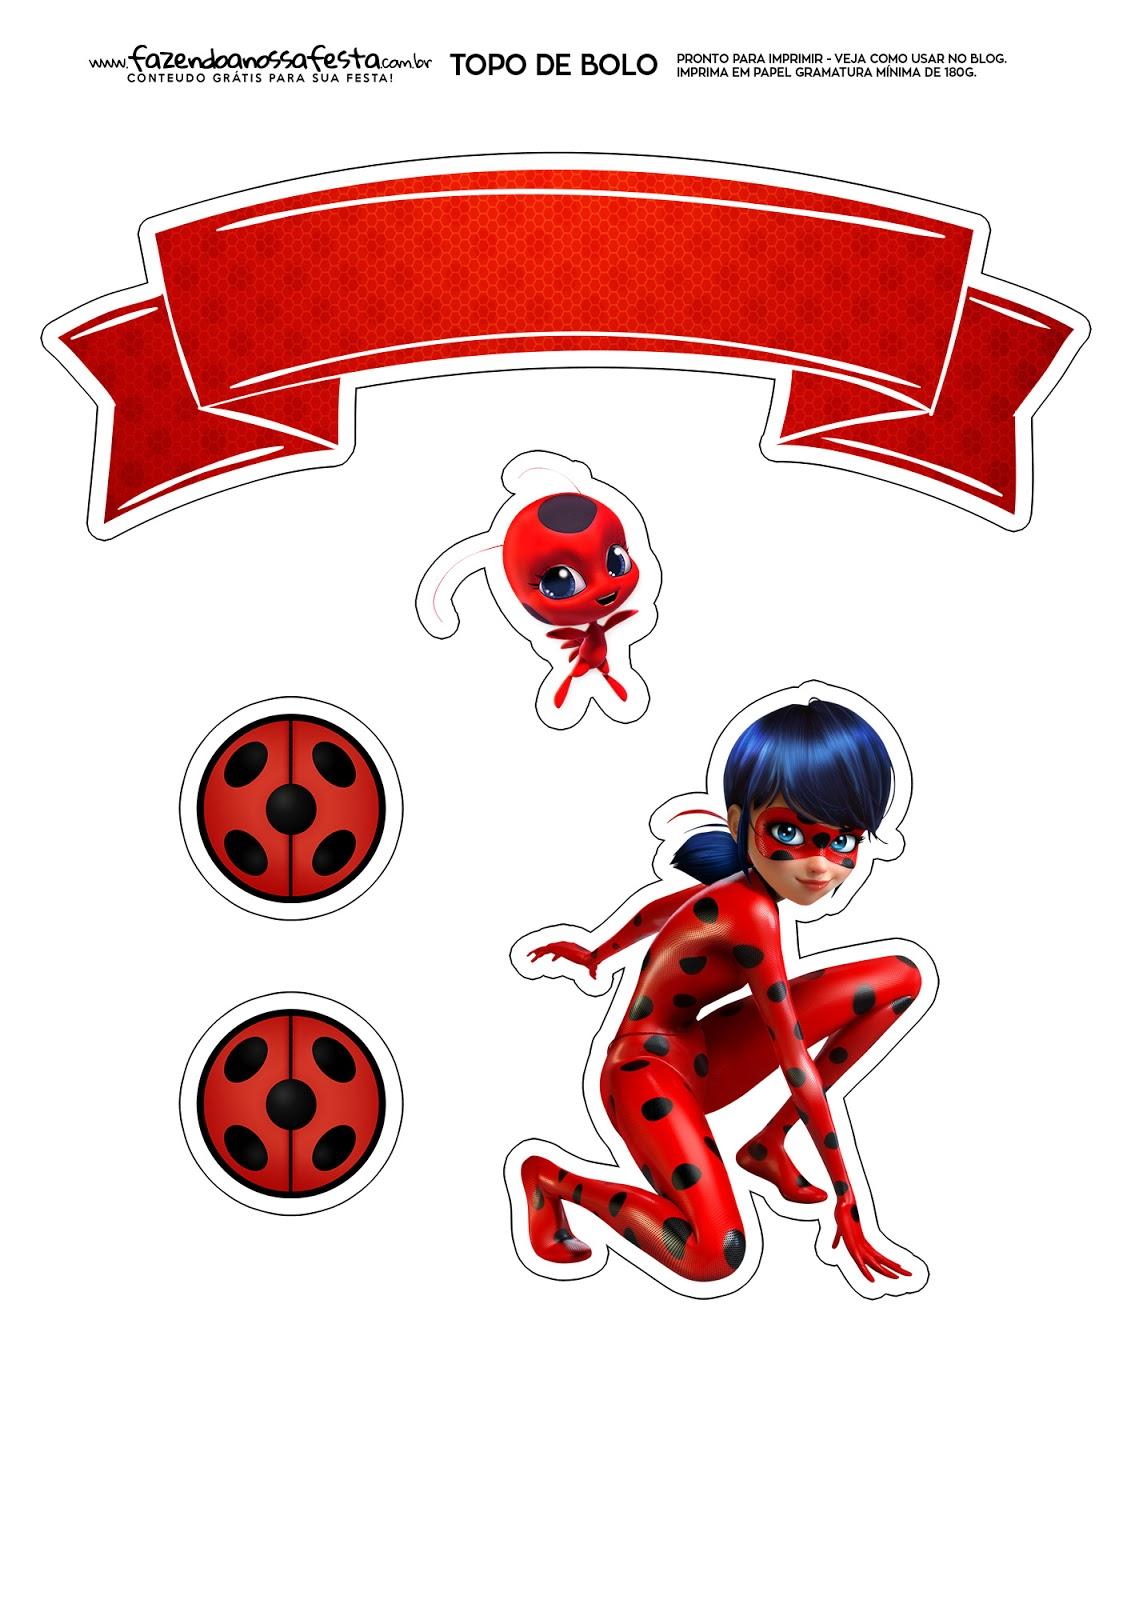 photograph about Ladybug Printable called MIraculous Ladybug: Free of charge Printable Cake Toppers. - Oh My